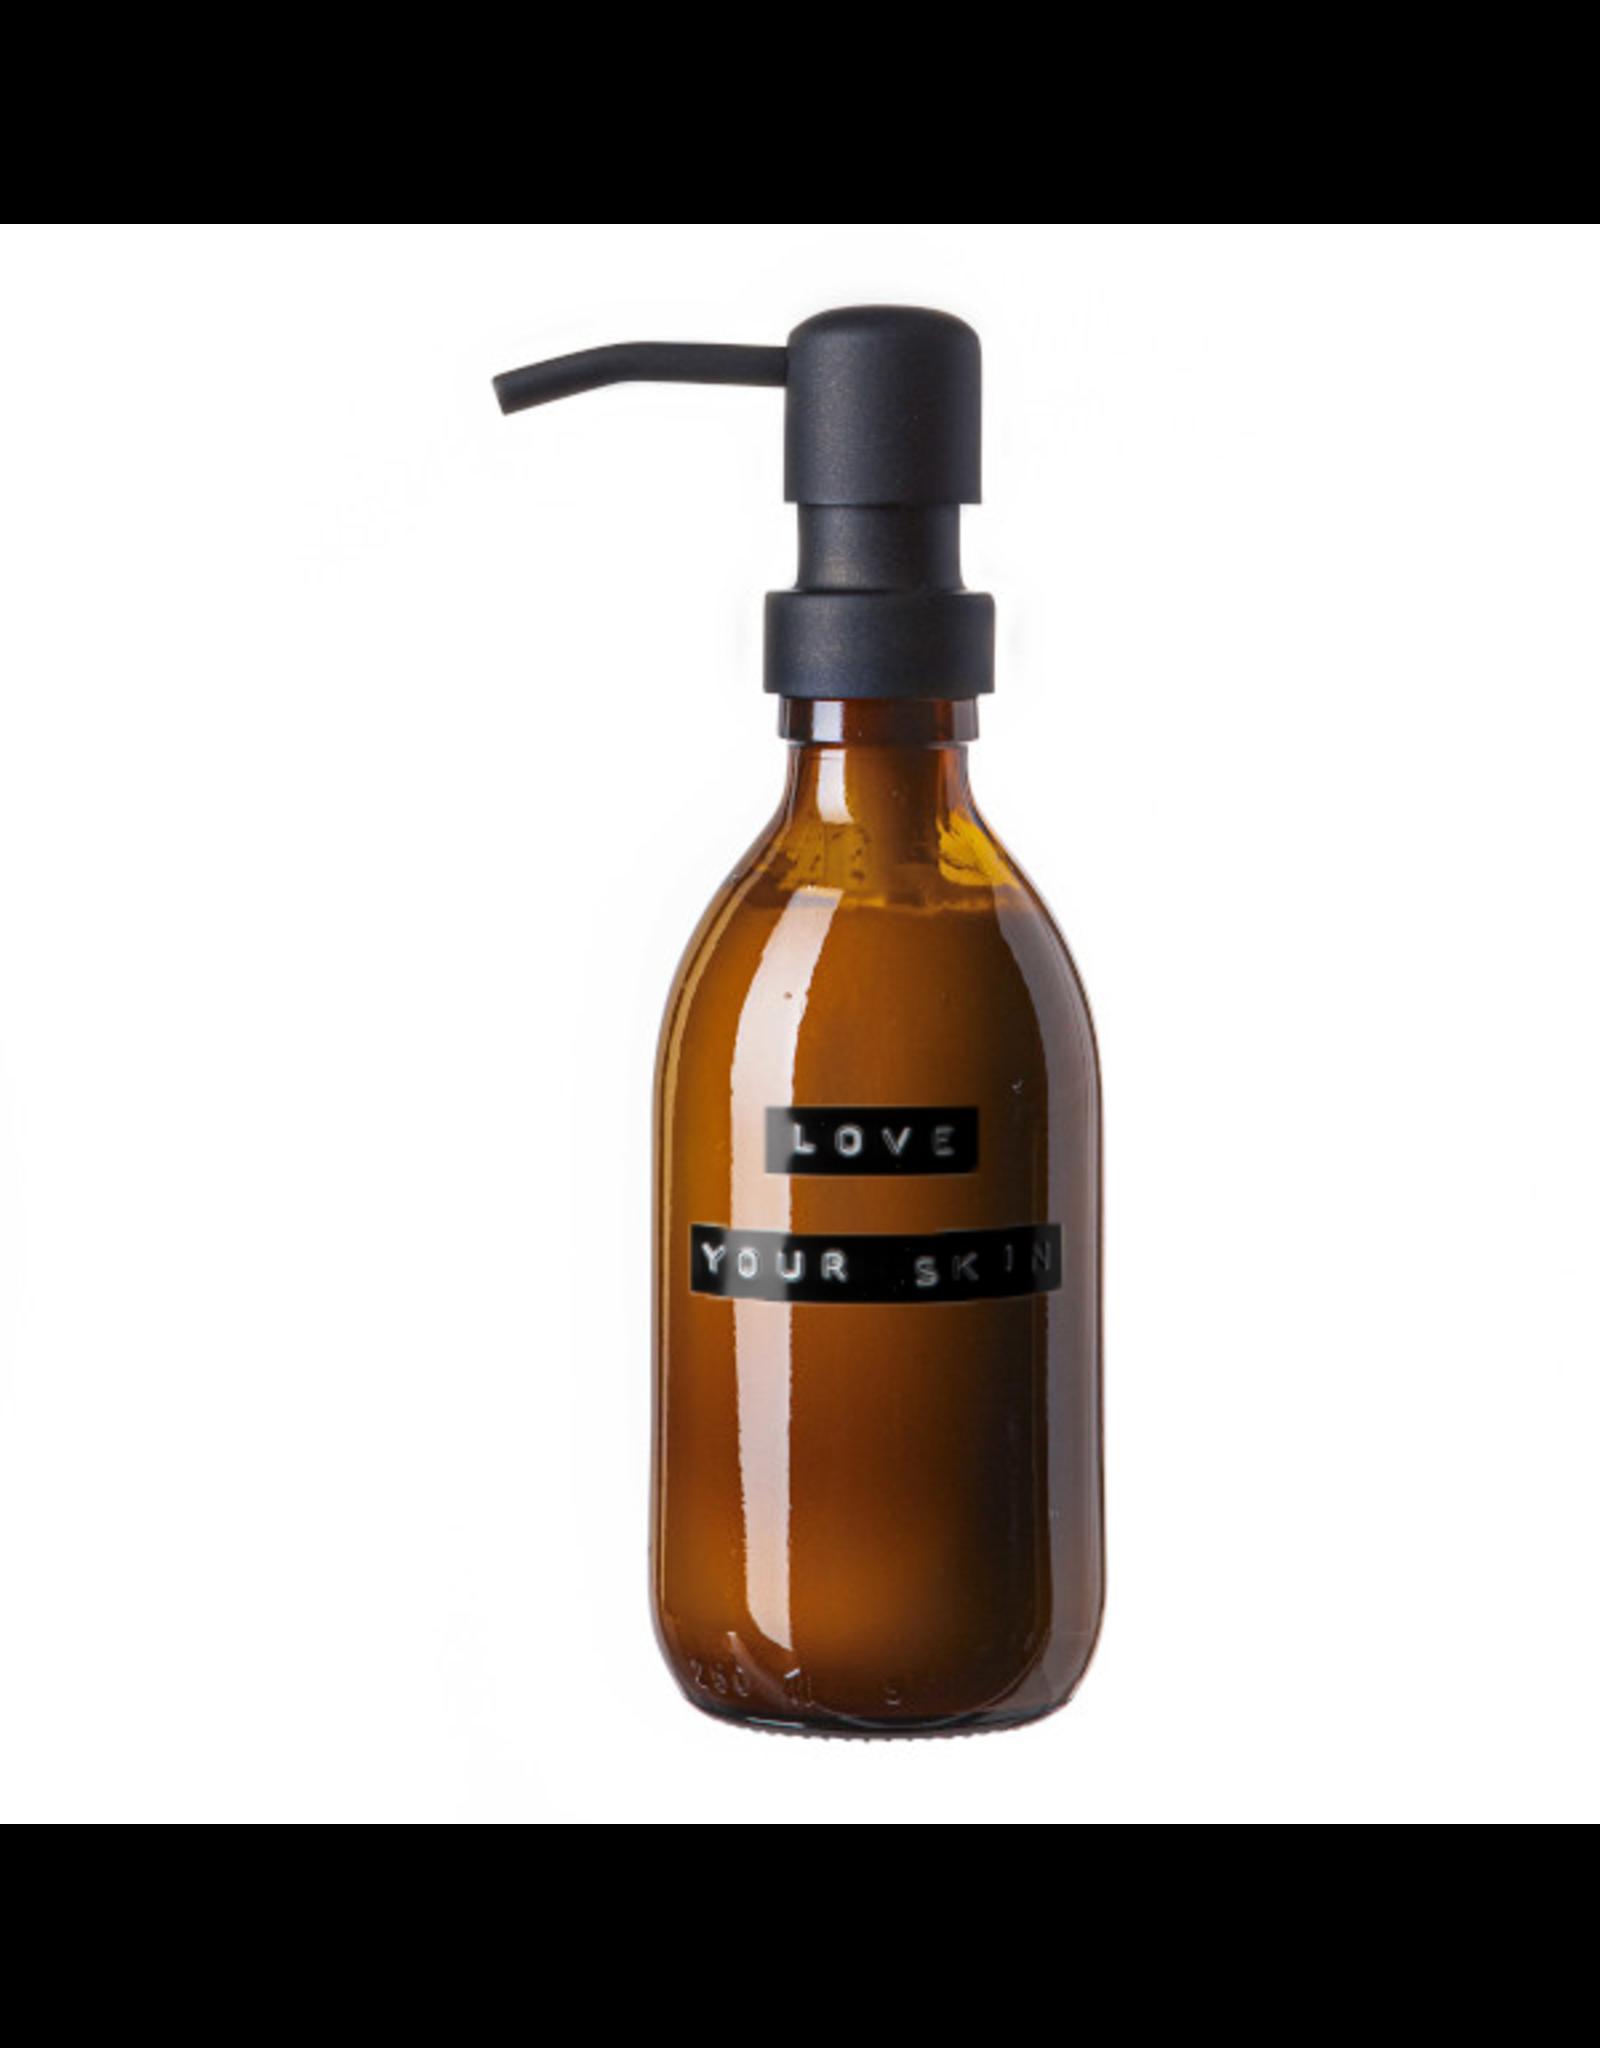 Handcrème aloë vera 'Love your skin' 250 ml